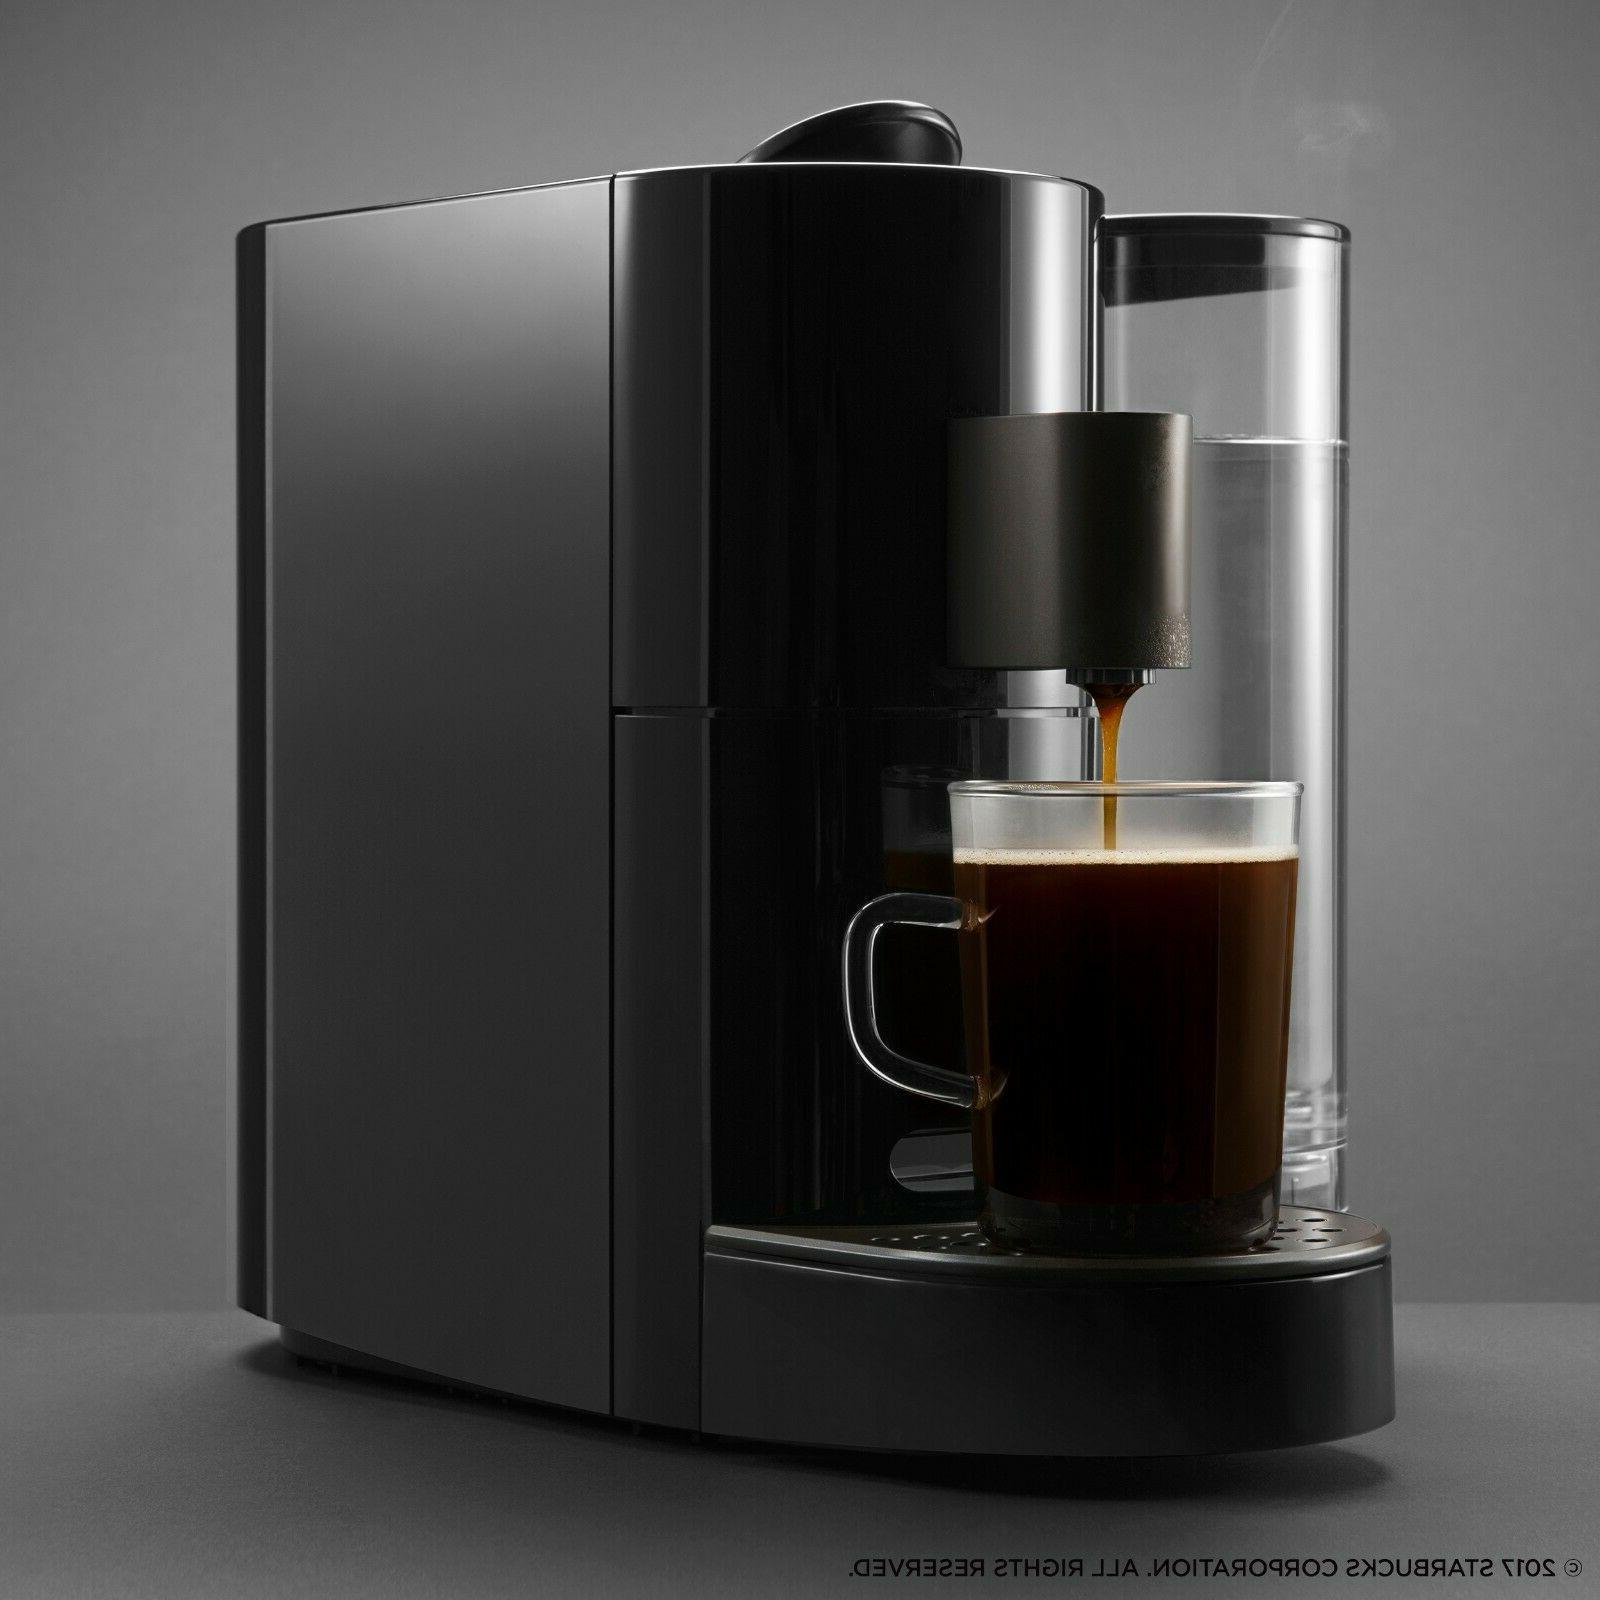 Starbucks Coffee Maker 762111144065